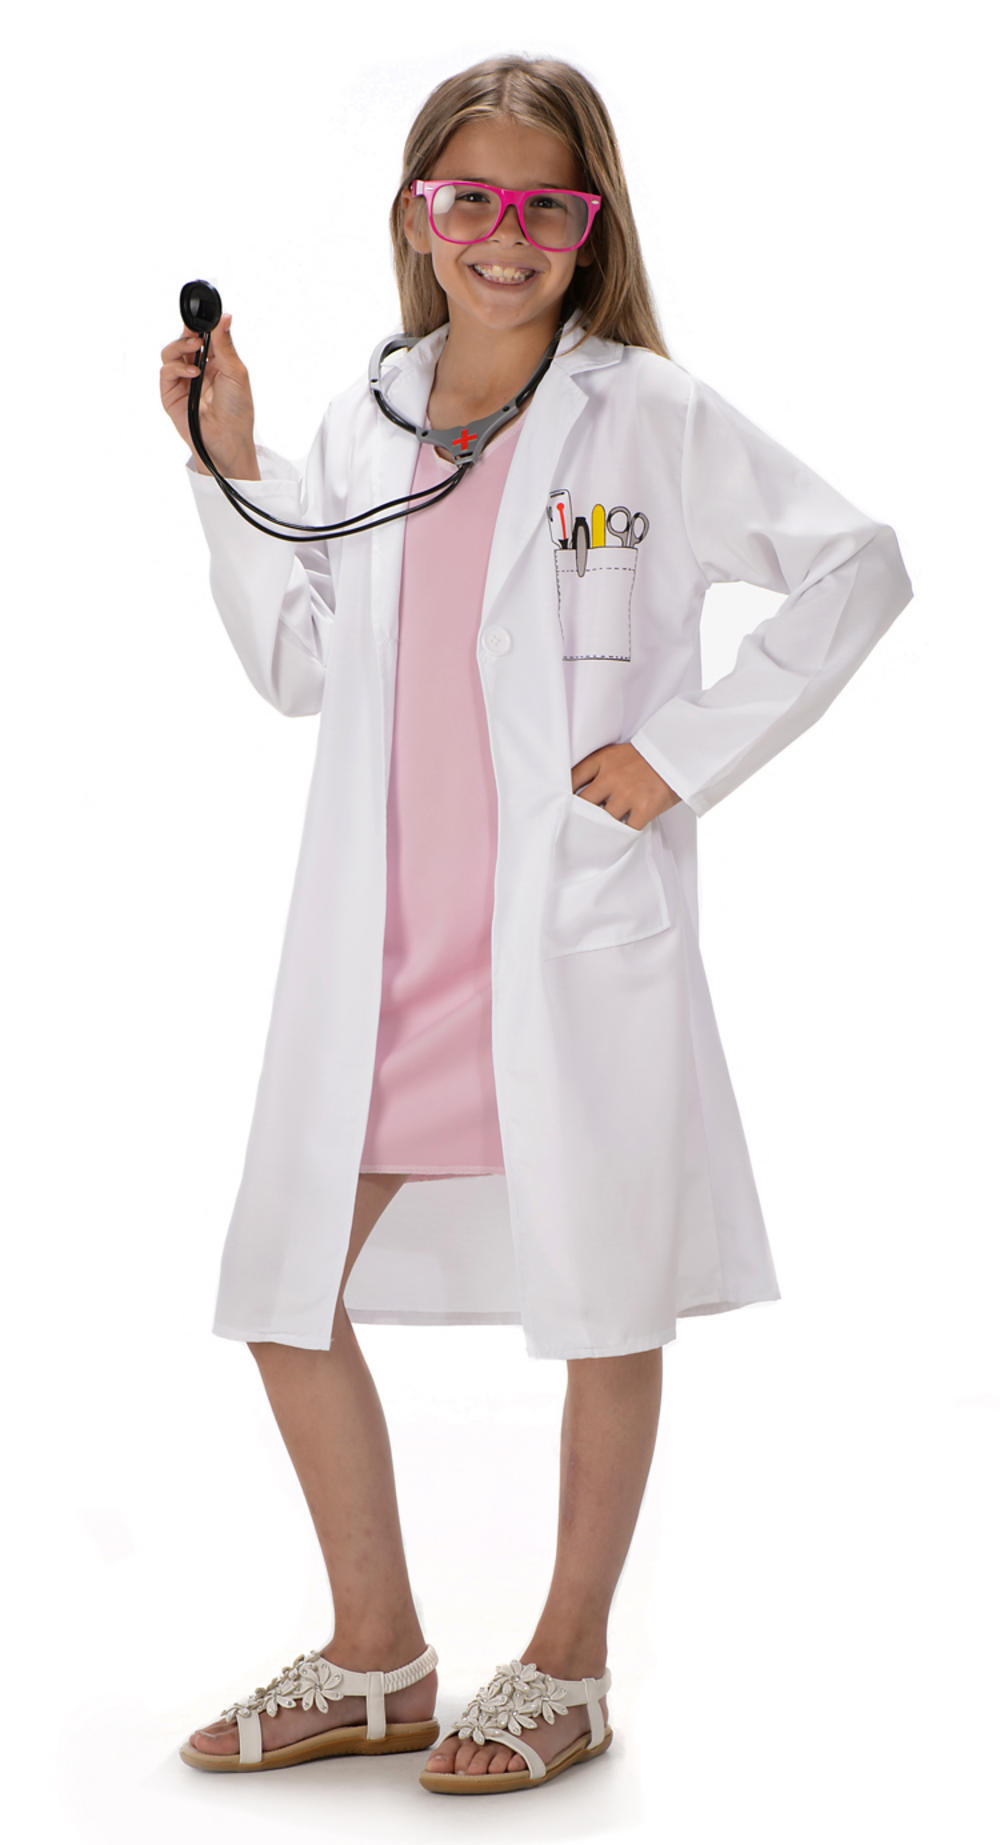 df09ff9e561 Doctor Girls Costume